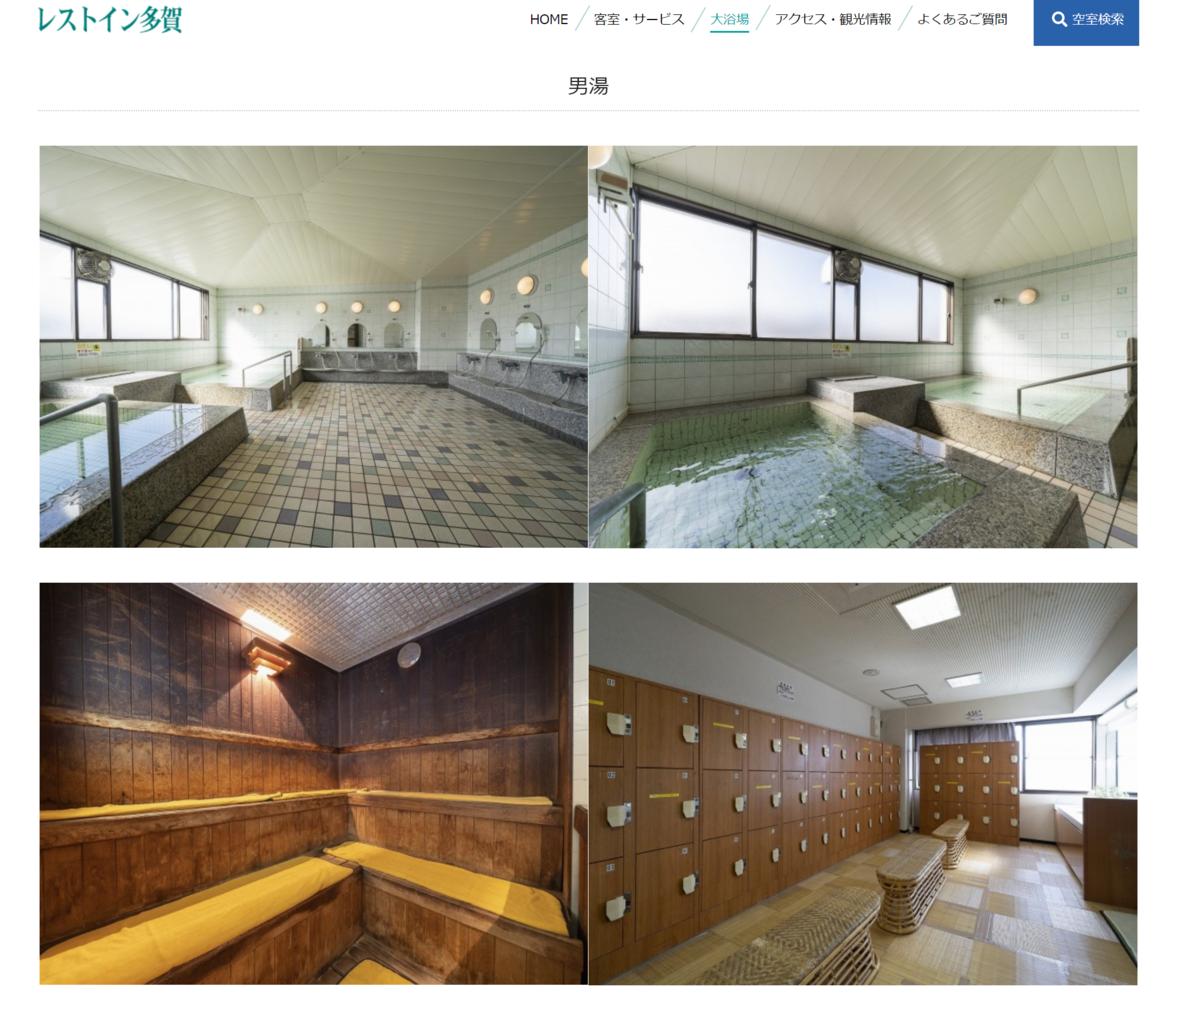 f:id:sawamura_eriri:20200417012542p:plain